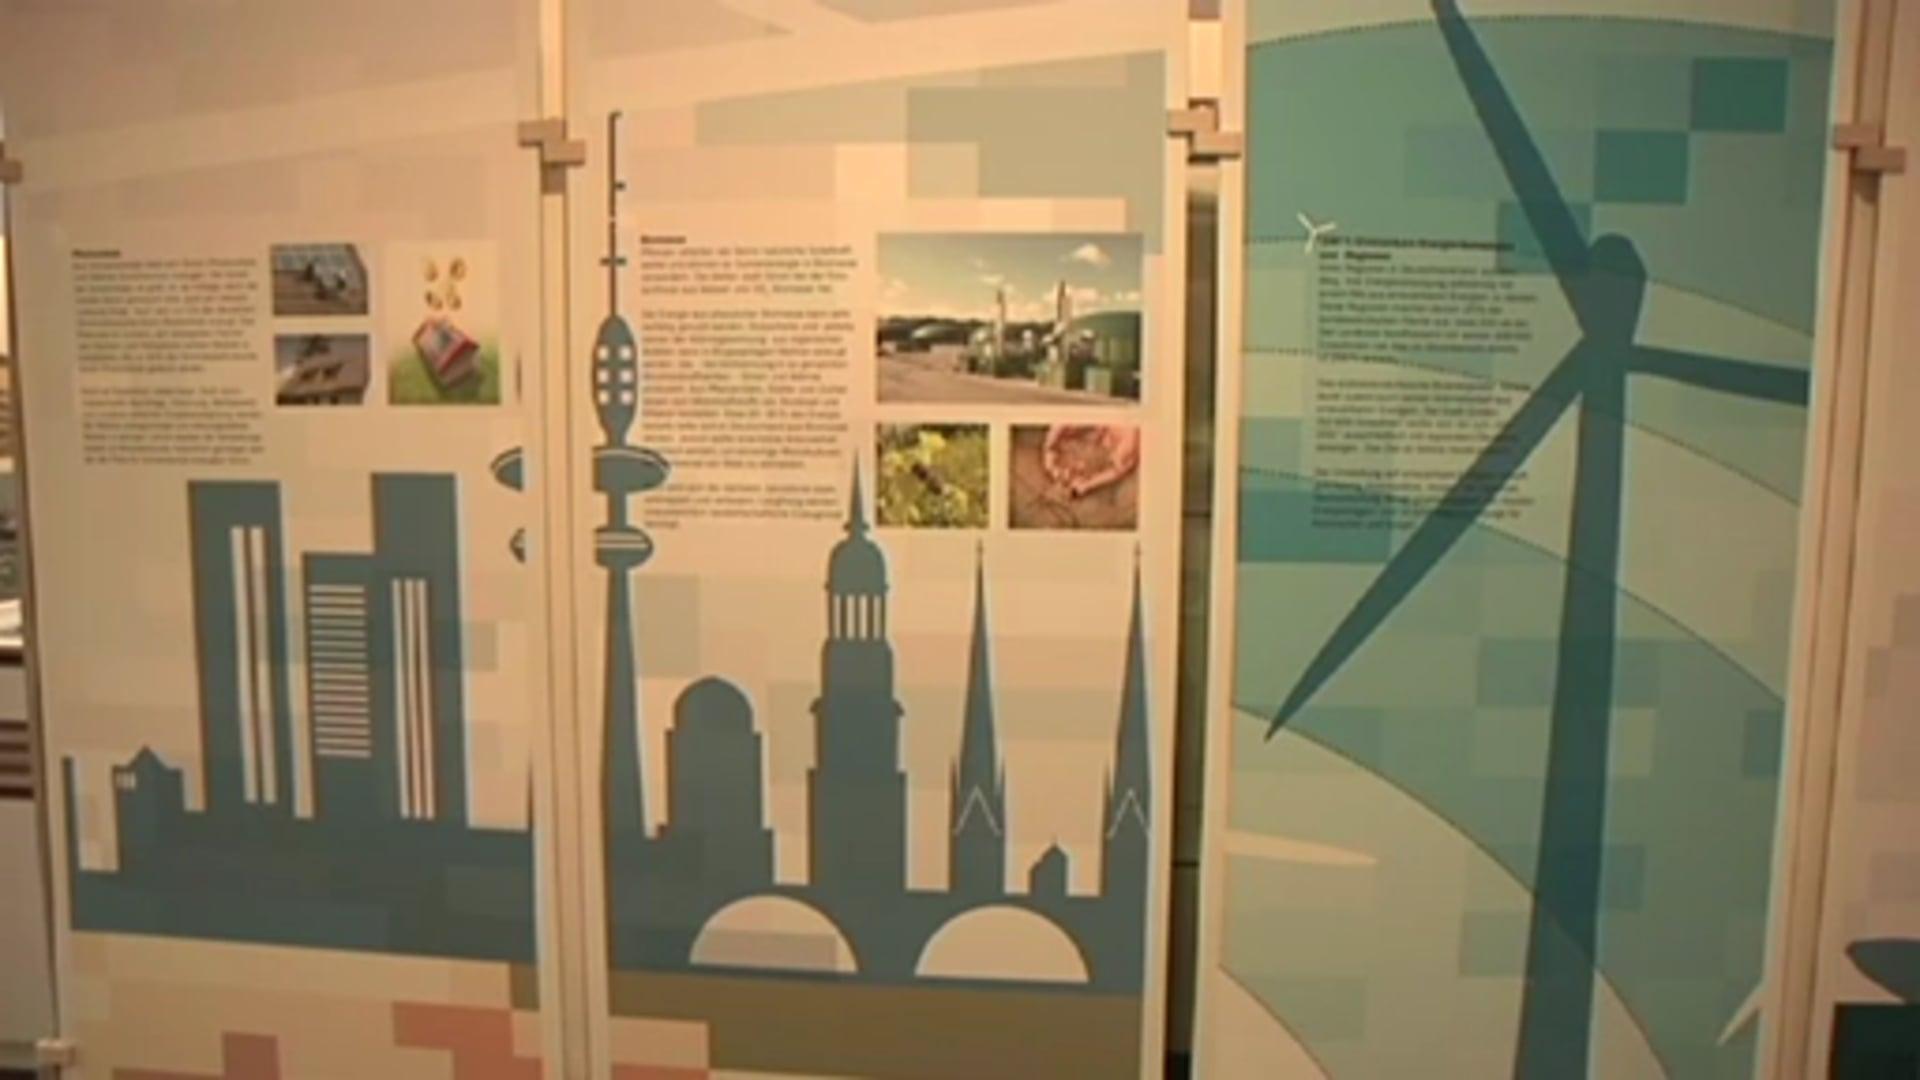 Ausstellung im Emslandmuseum